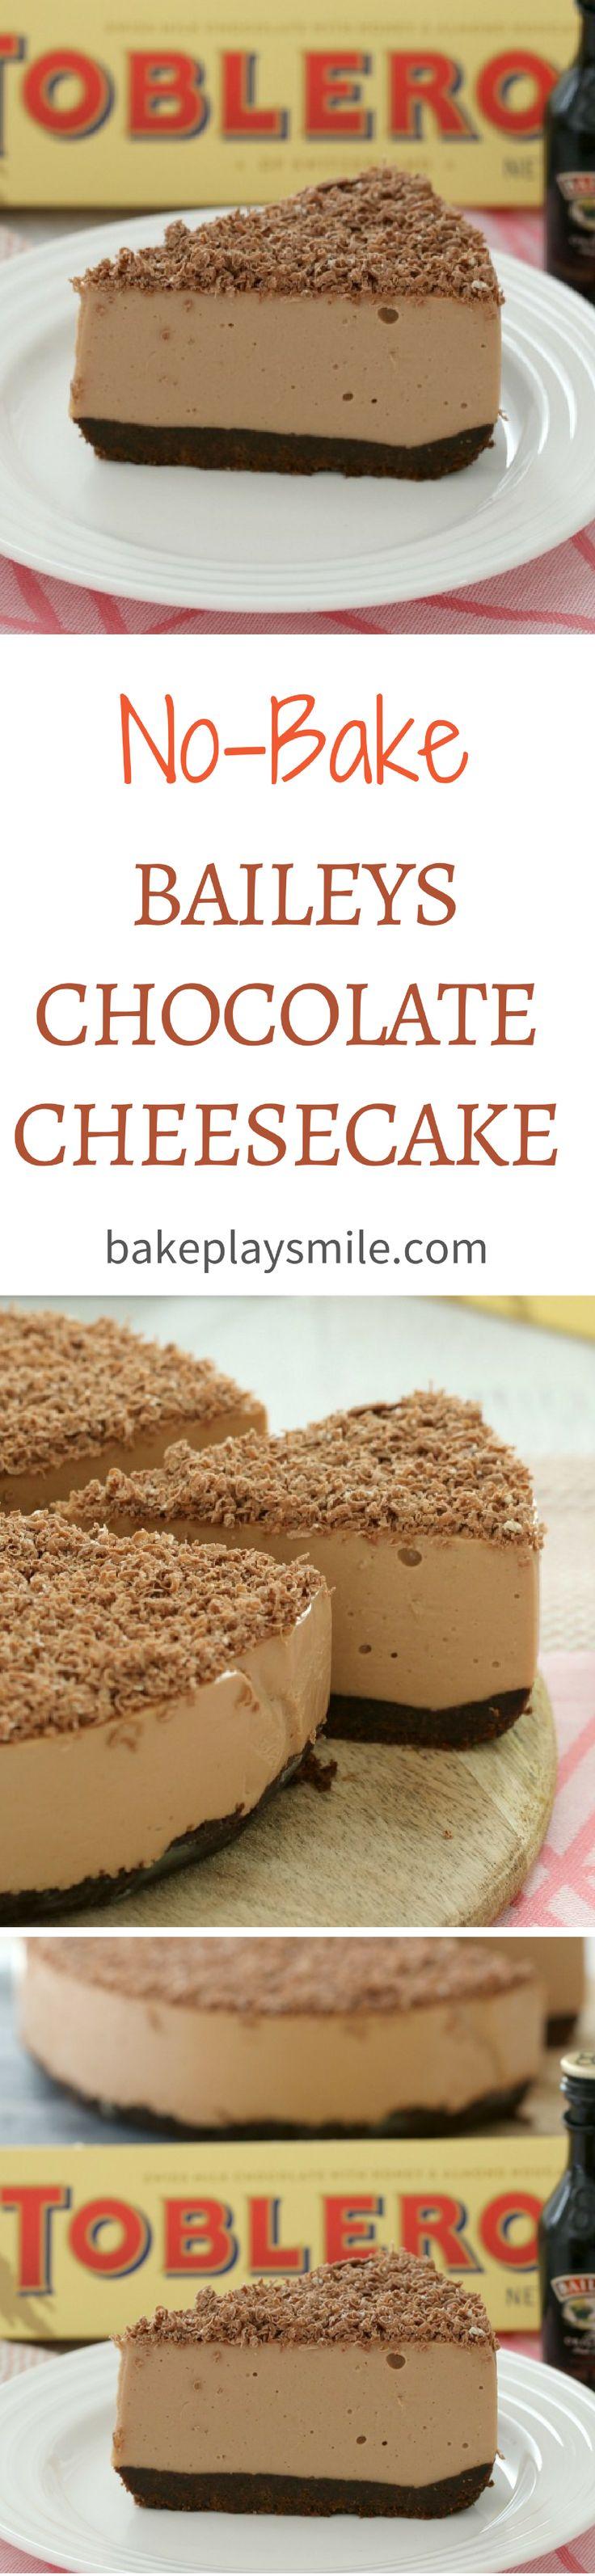 No-Bake Baileys Chocolate Cheesecake